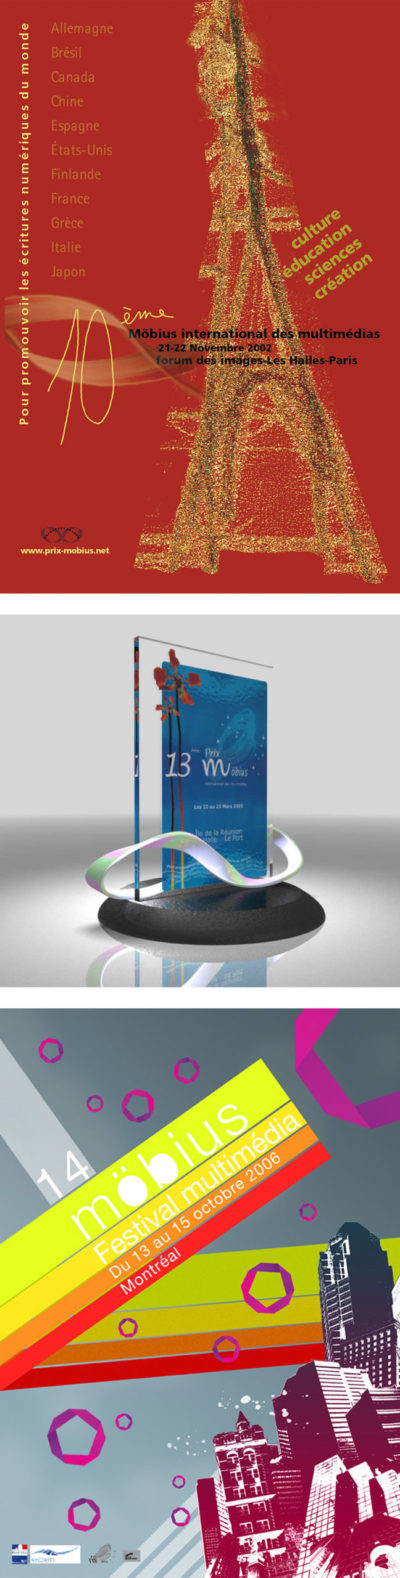 Archives Prix Möbius International des Multimédias